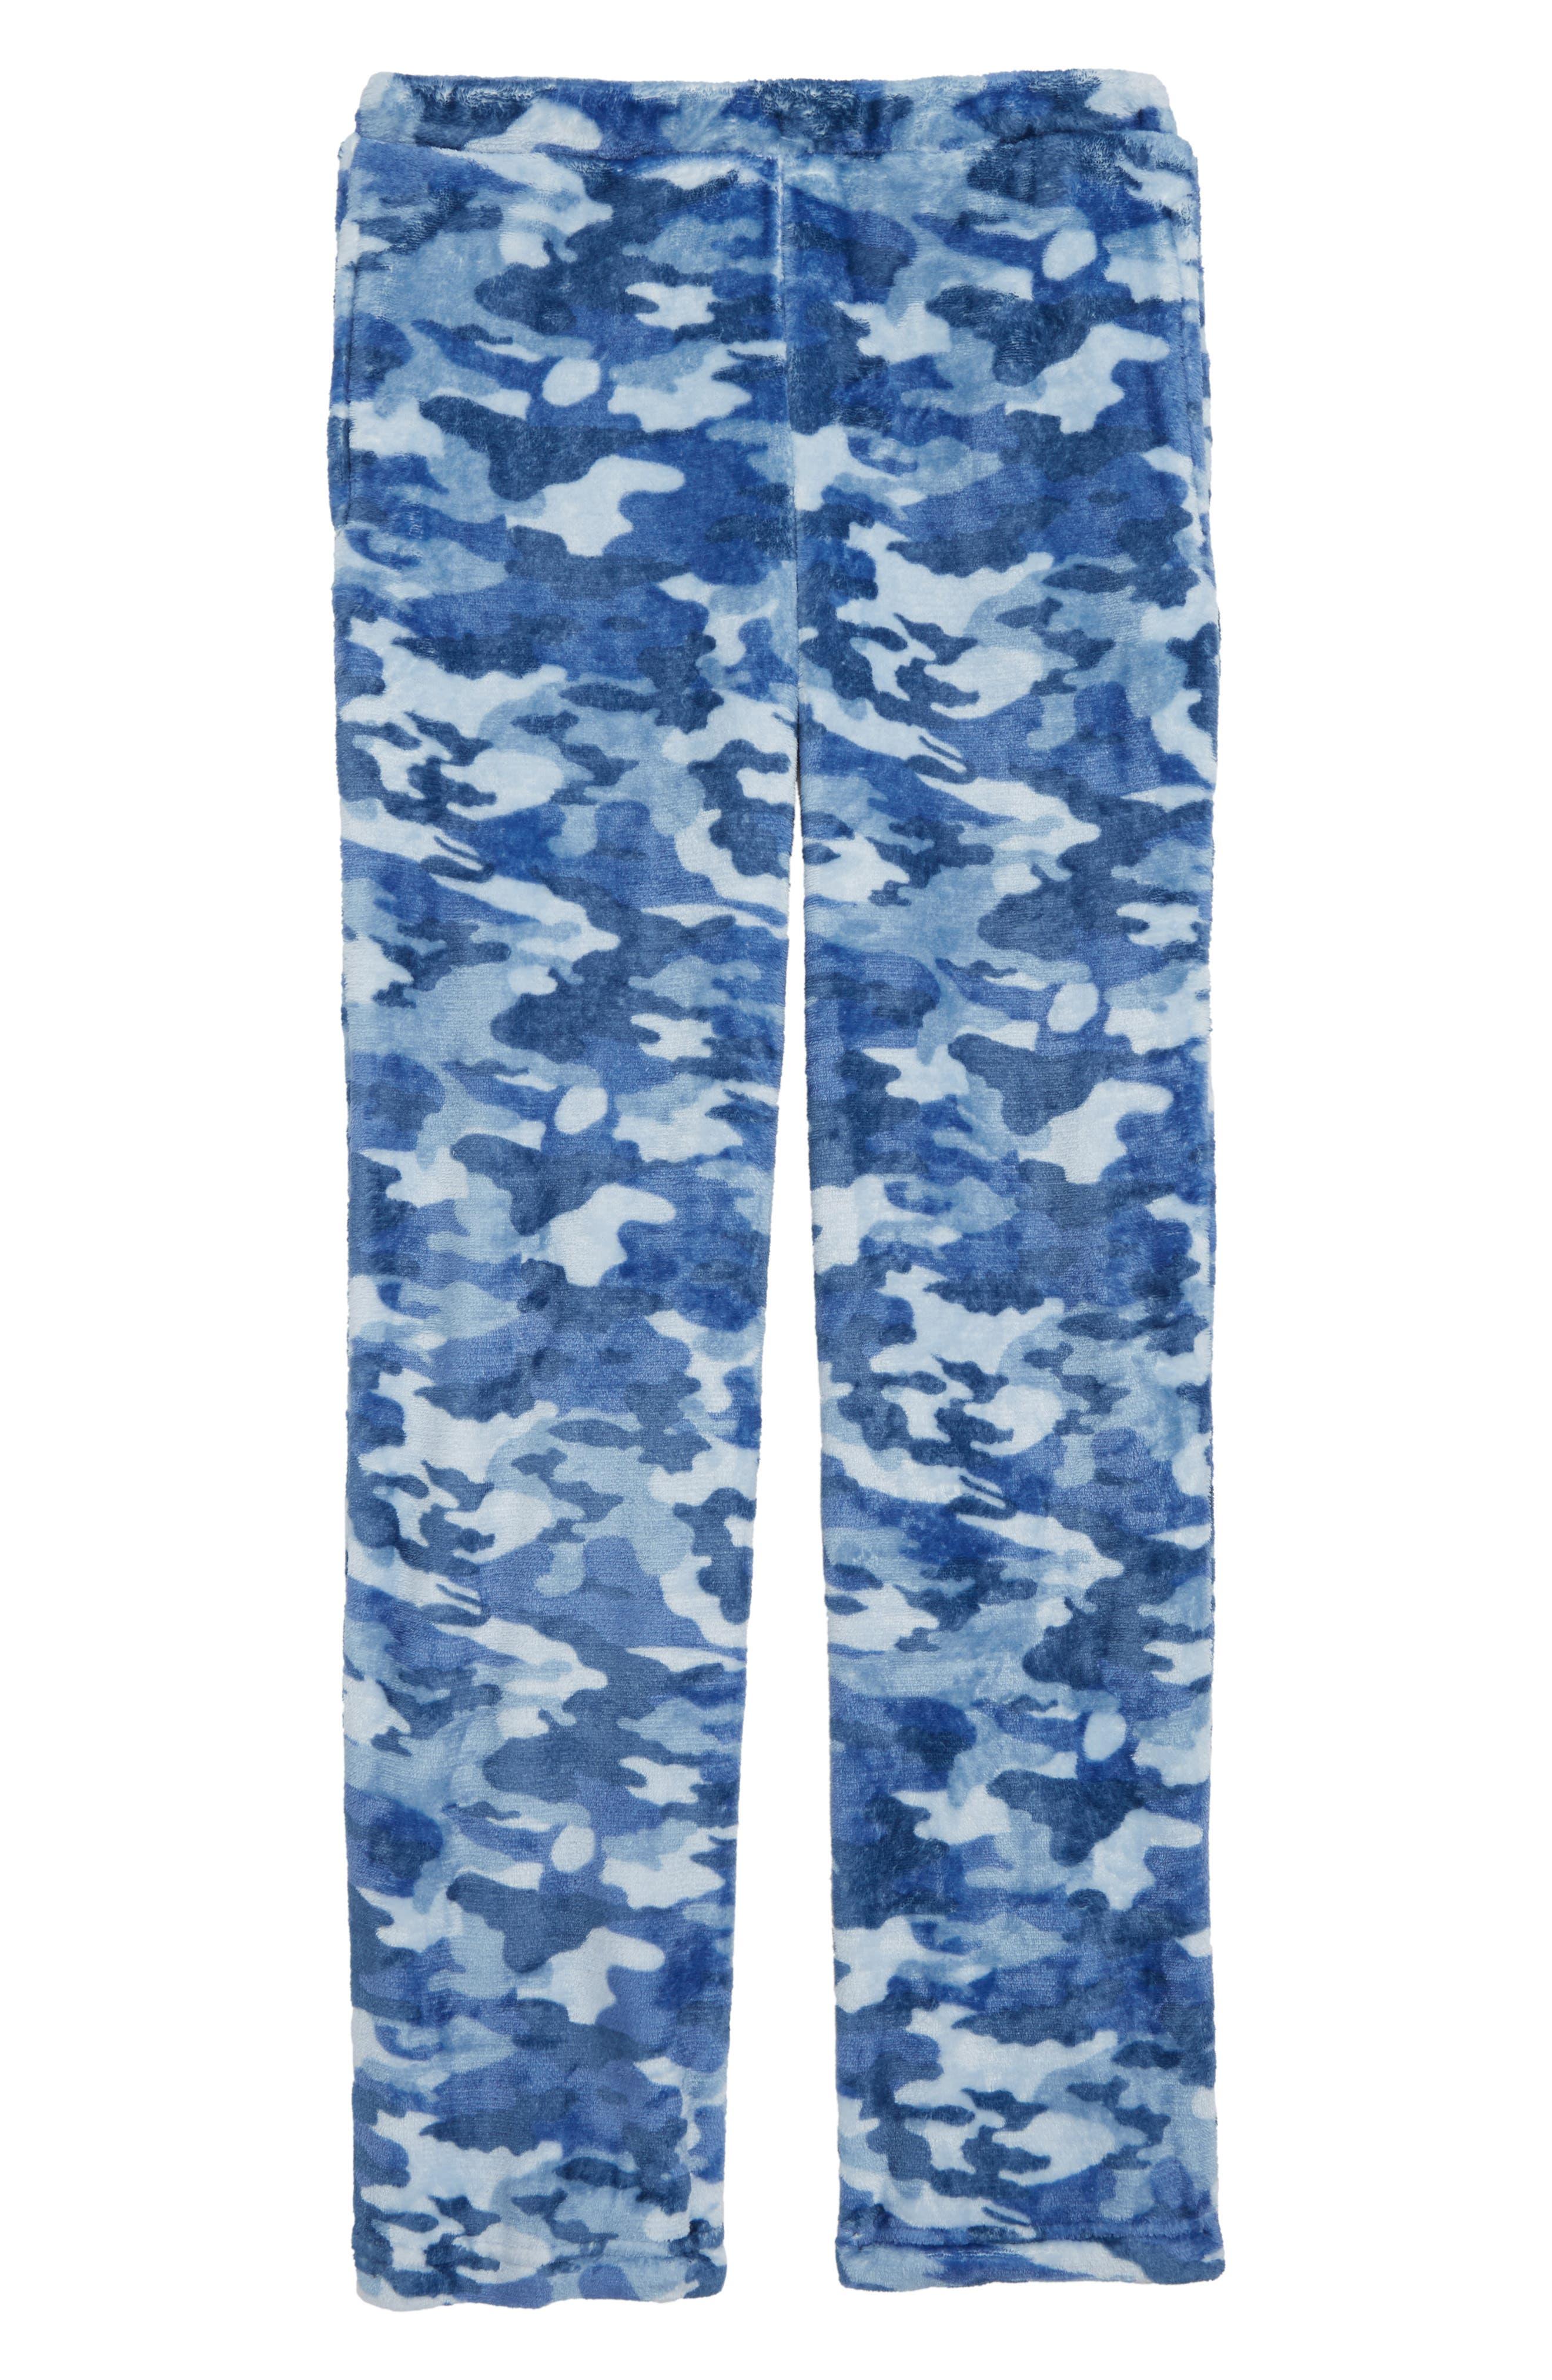 Camo Fleece Pajama Pants,                             Main thumbnail 1, color,                             NAVY